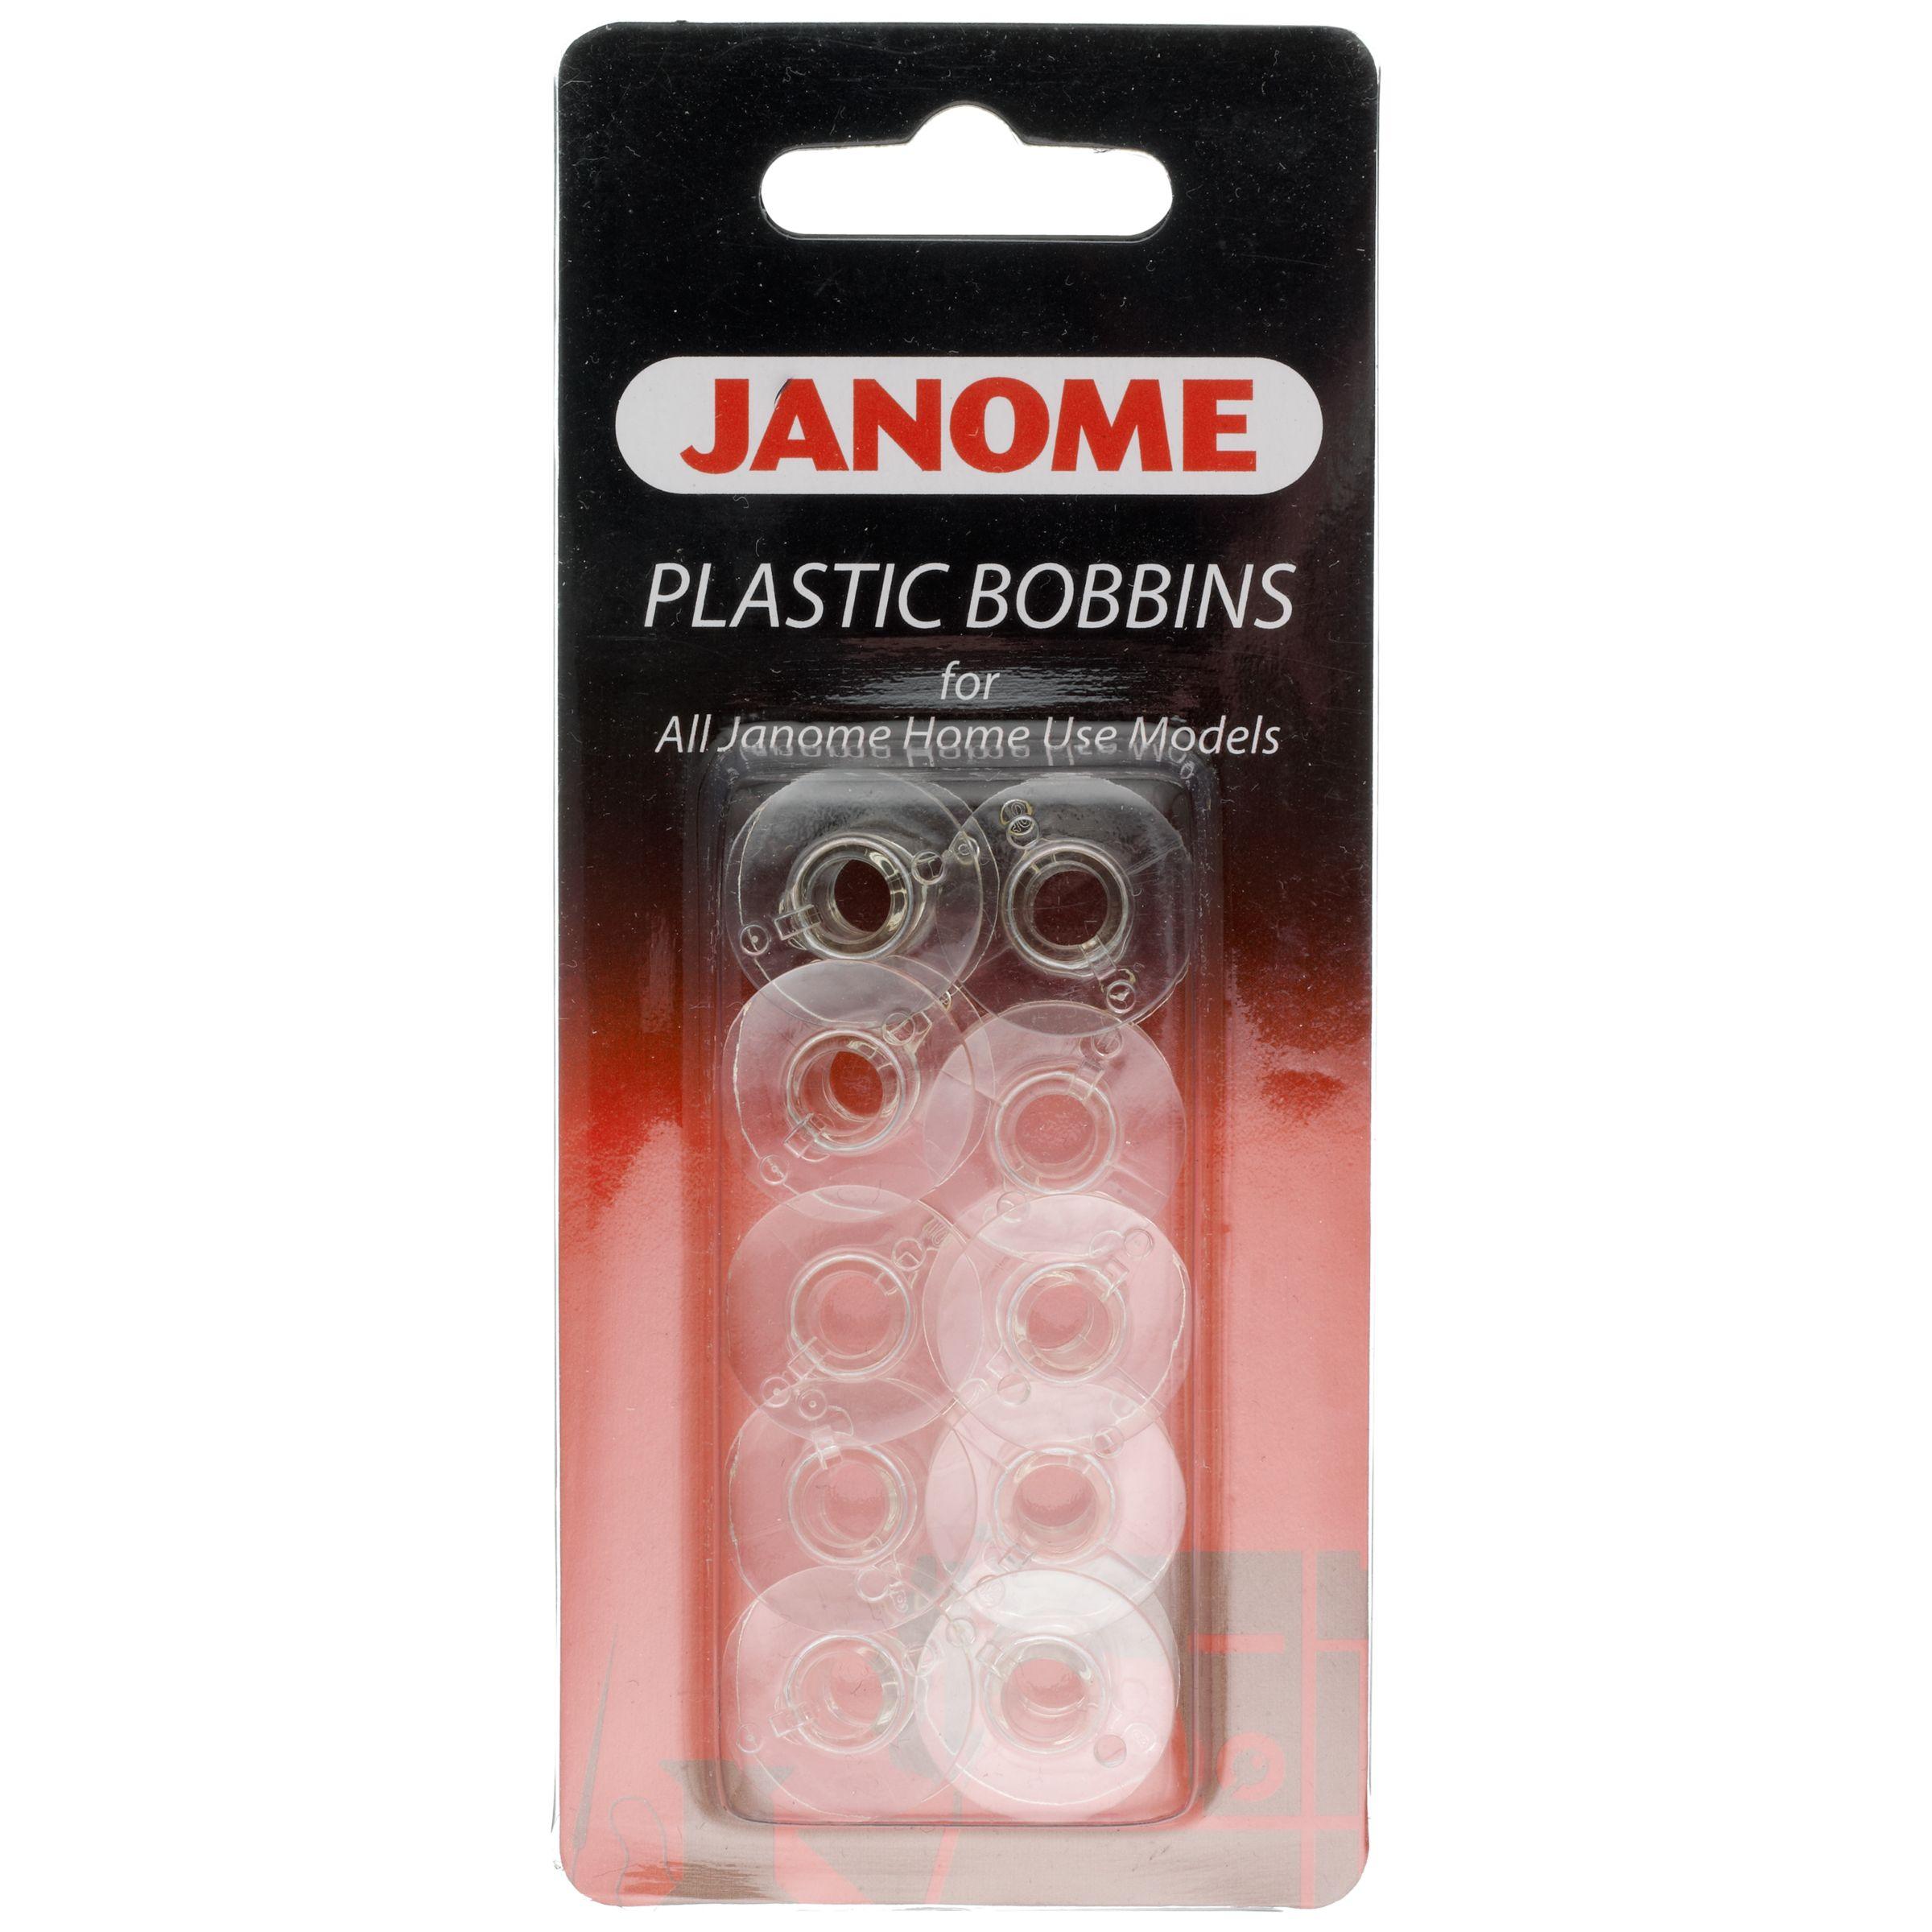 Janome Janome Plastic Bobbins, Pack of 10